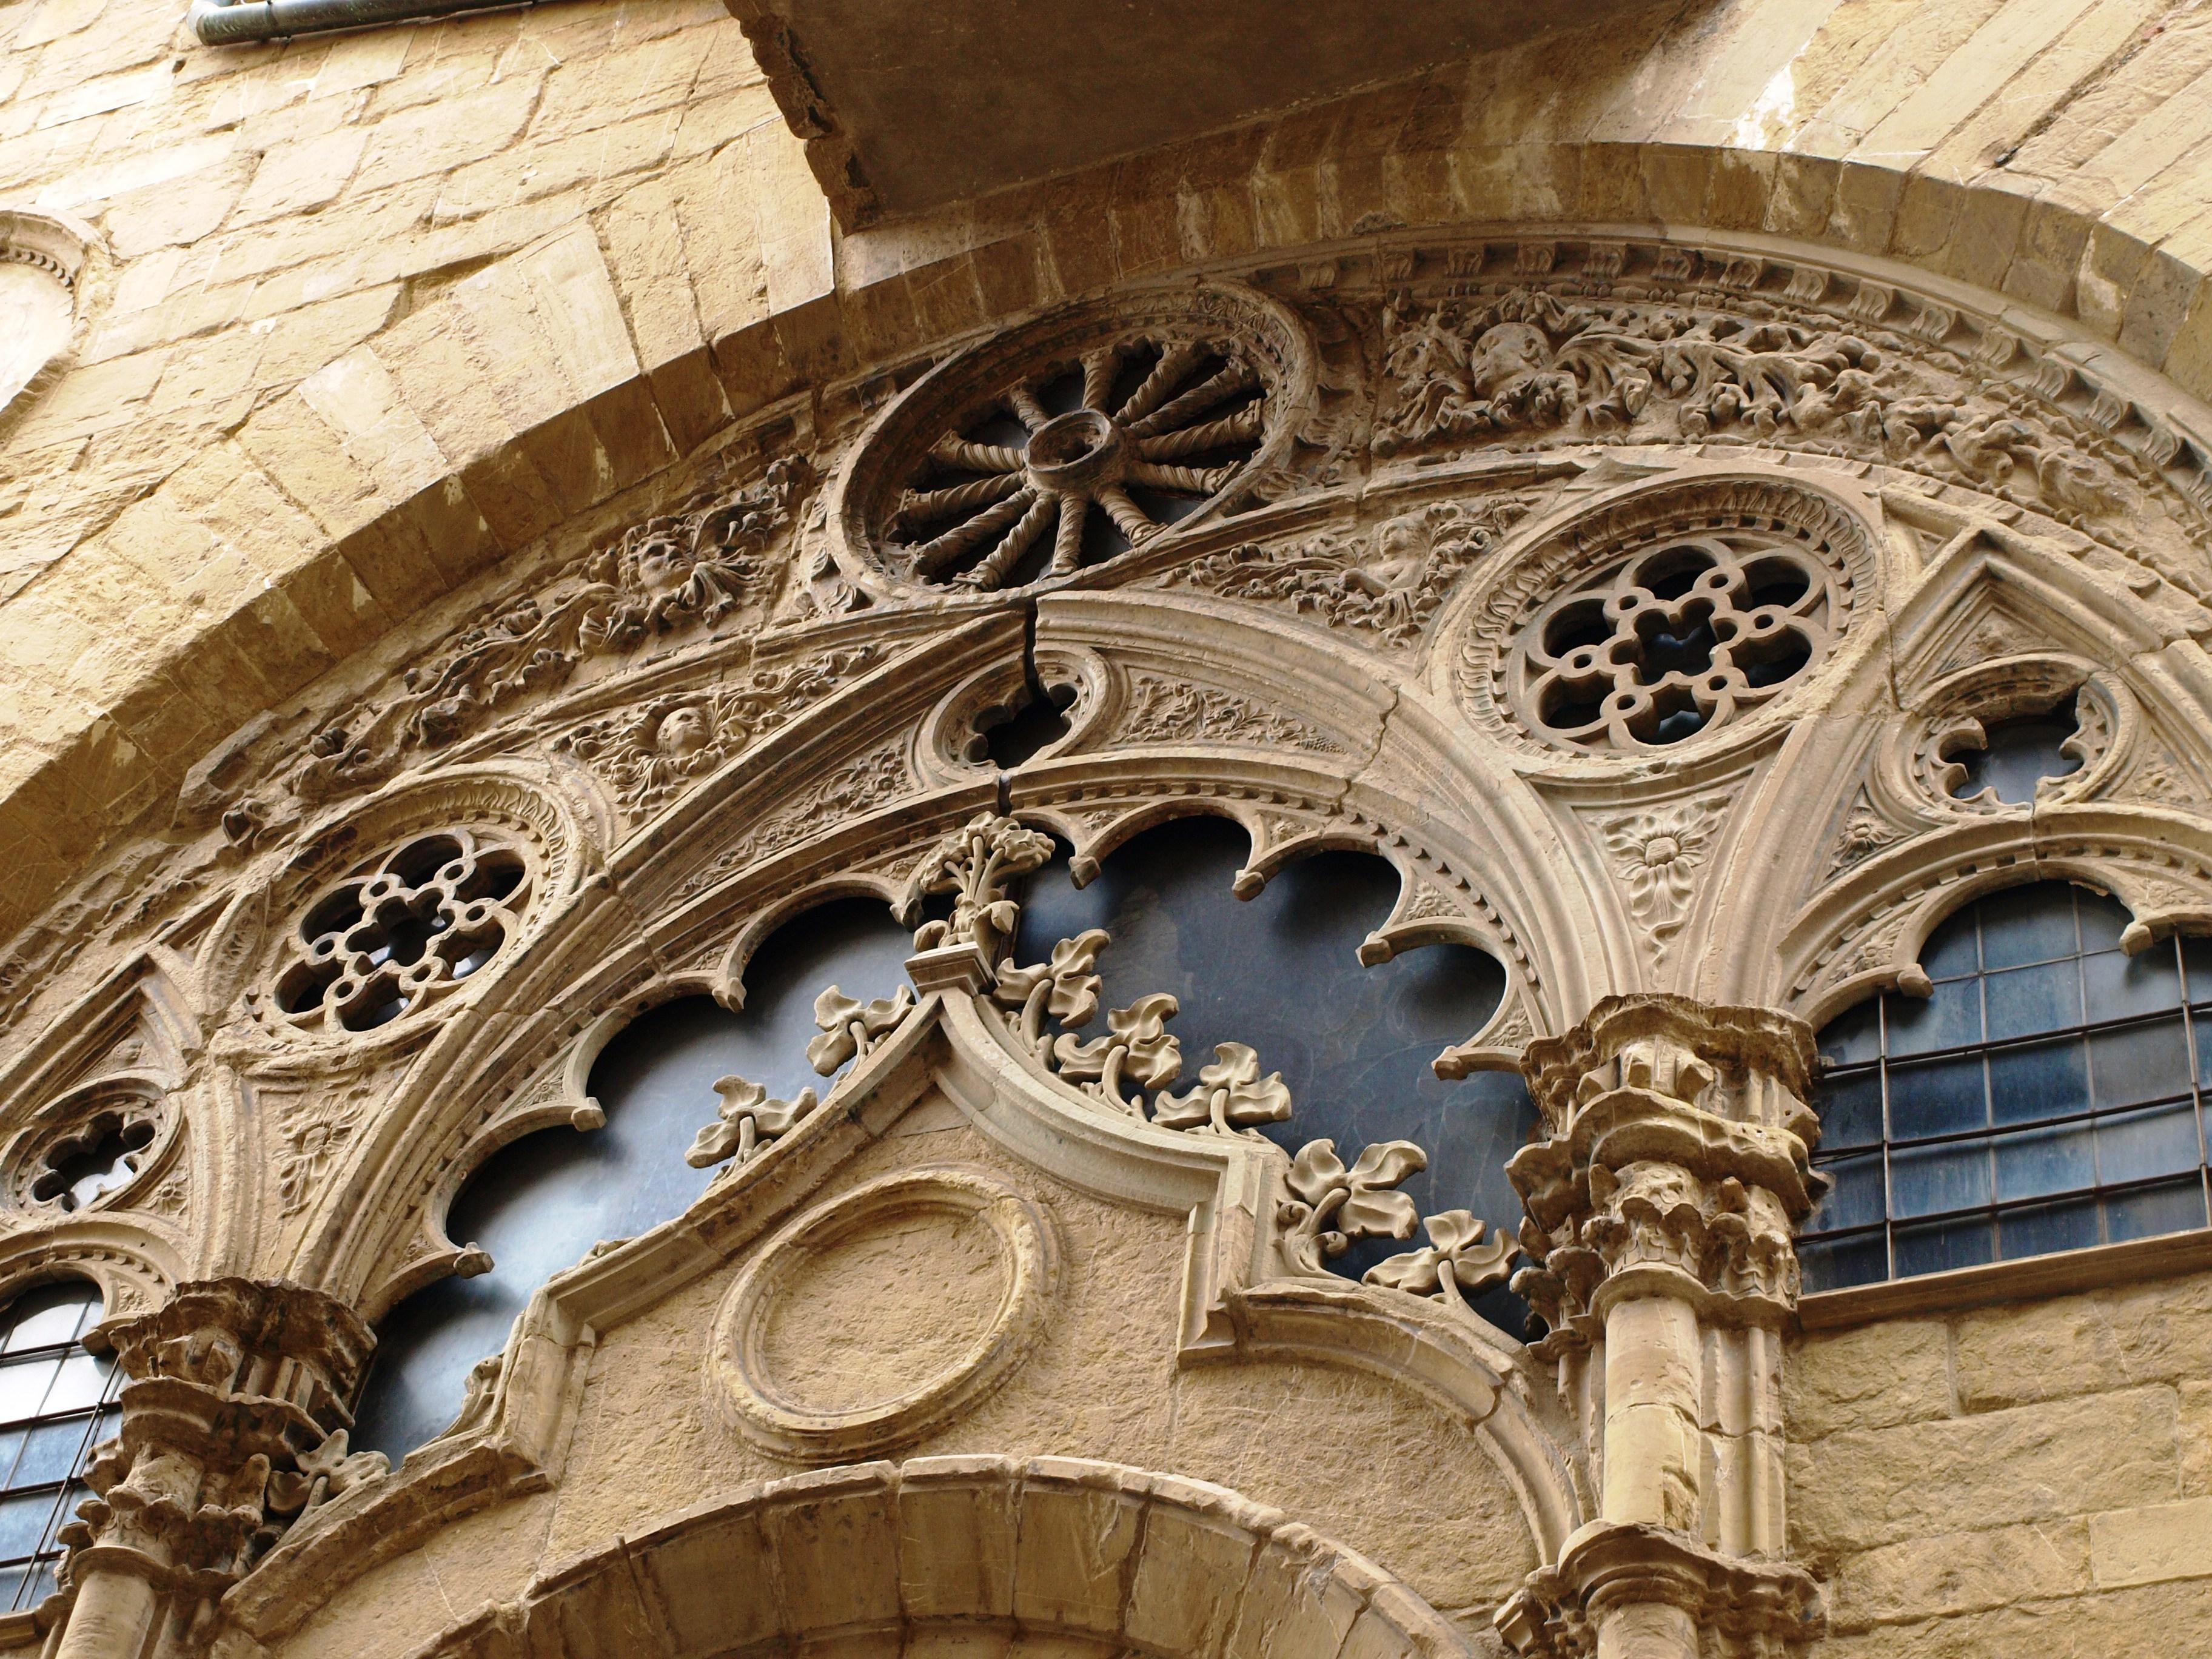 Itálie - Florencie - Orsanmichelle, detail kružby oken